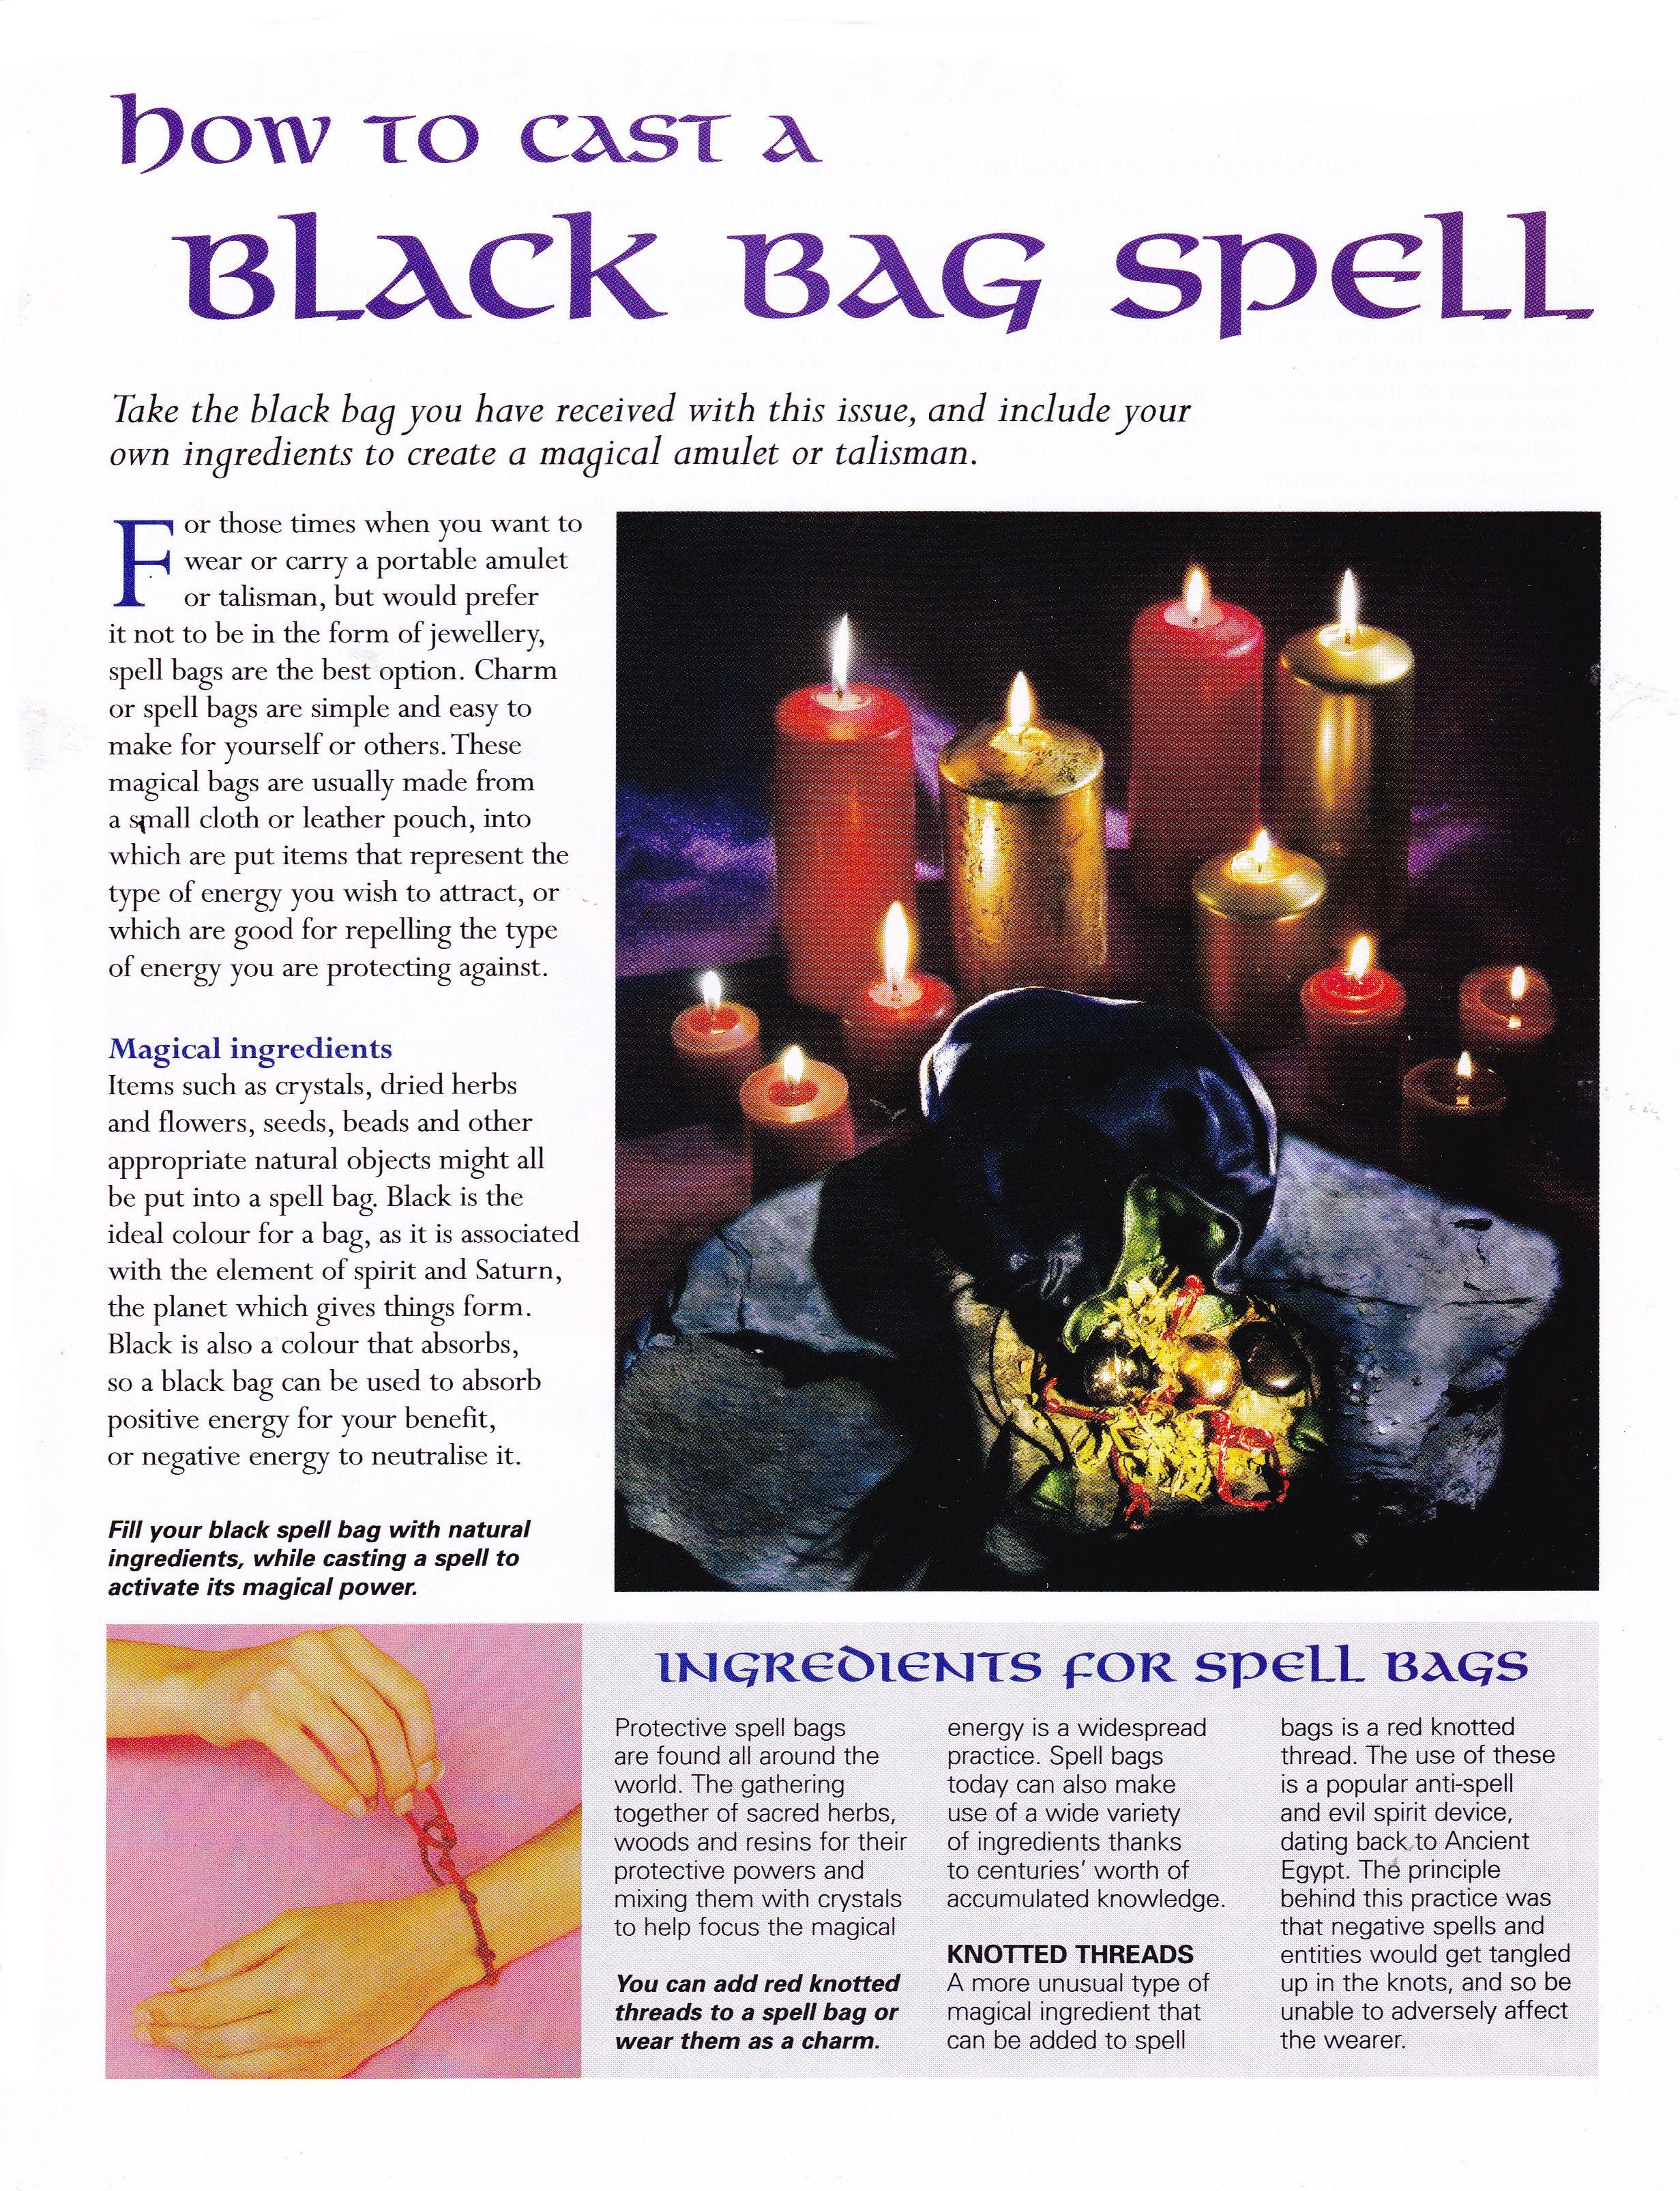 How to cast a black bag spell